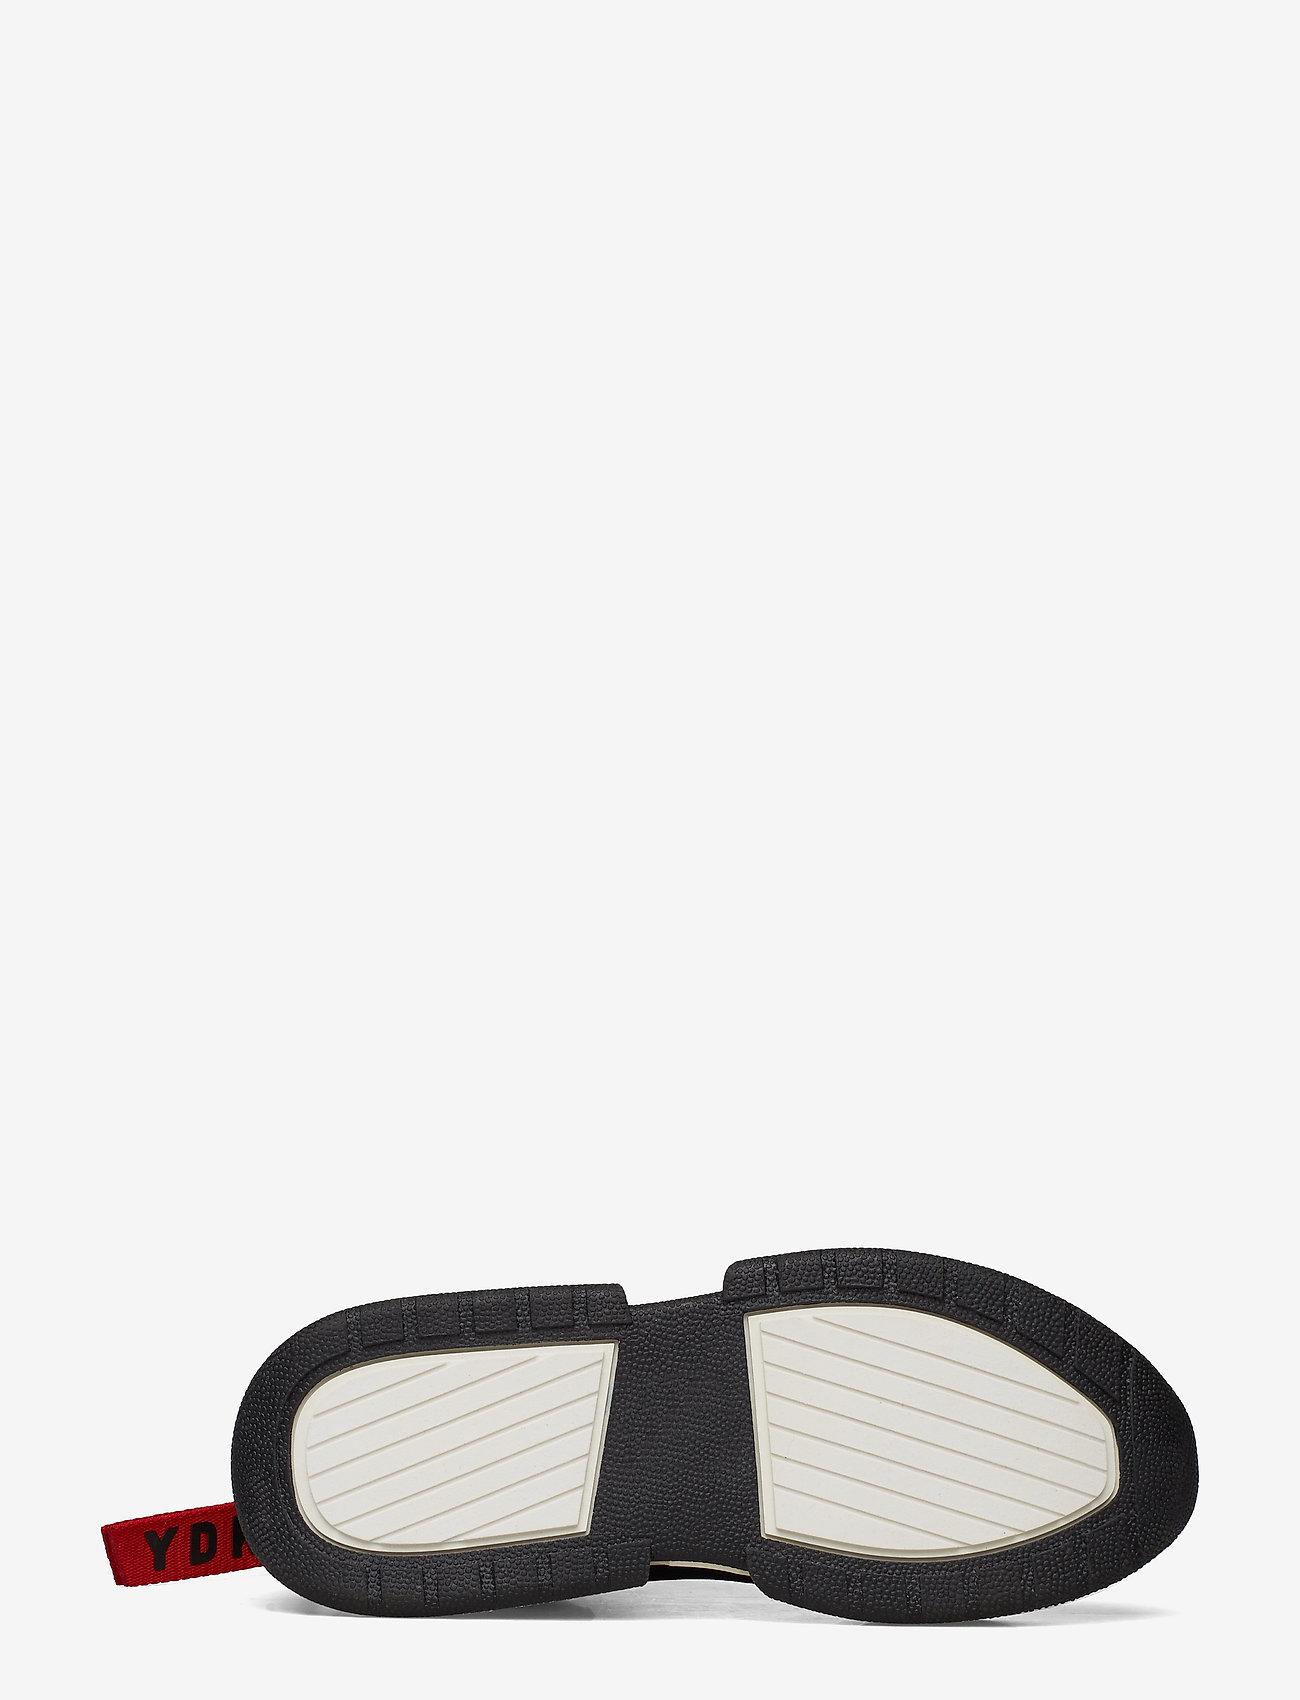 Marcel - Slip On Sne (Black) (112 €) - DKNY XxojK